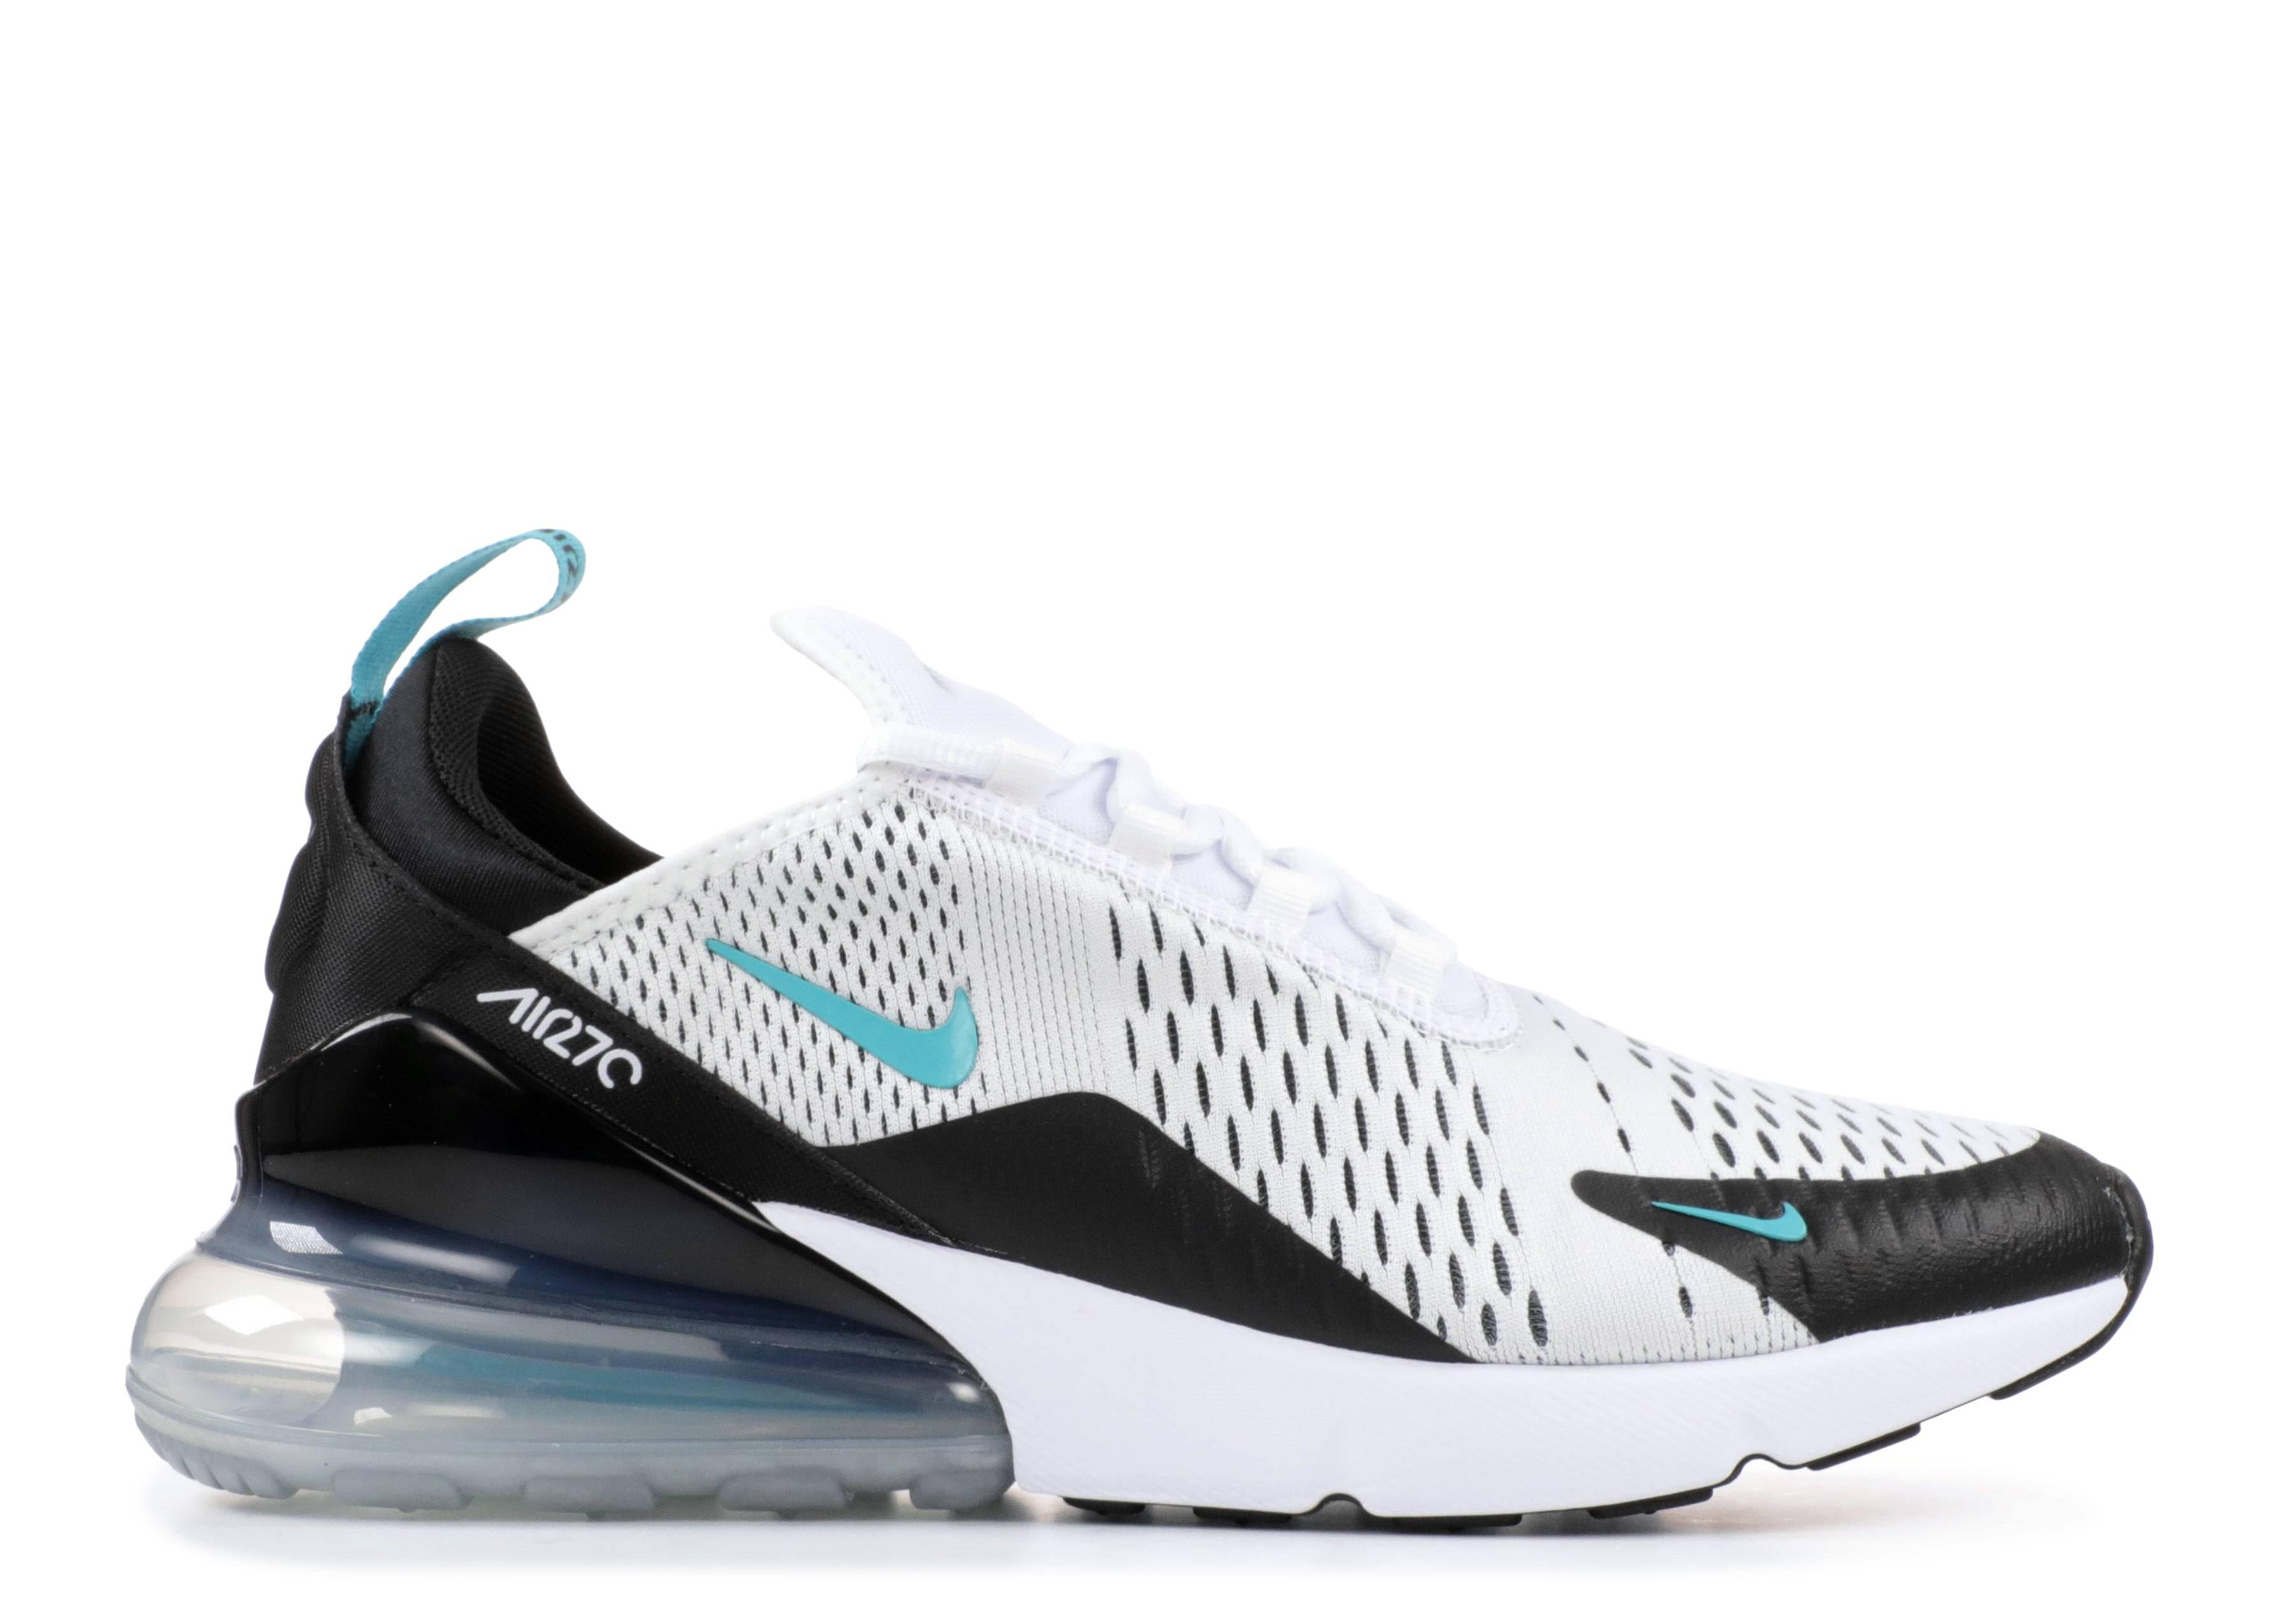 Todopoderoso tolerancia perdí mi camino  Nike Air Max 270 Sneakers | Flight Club